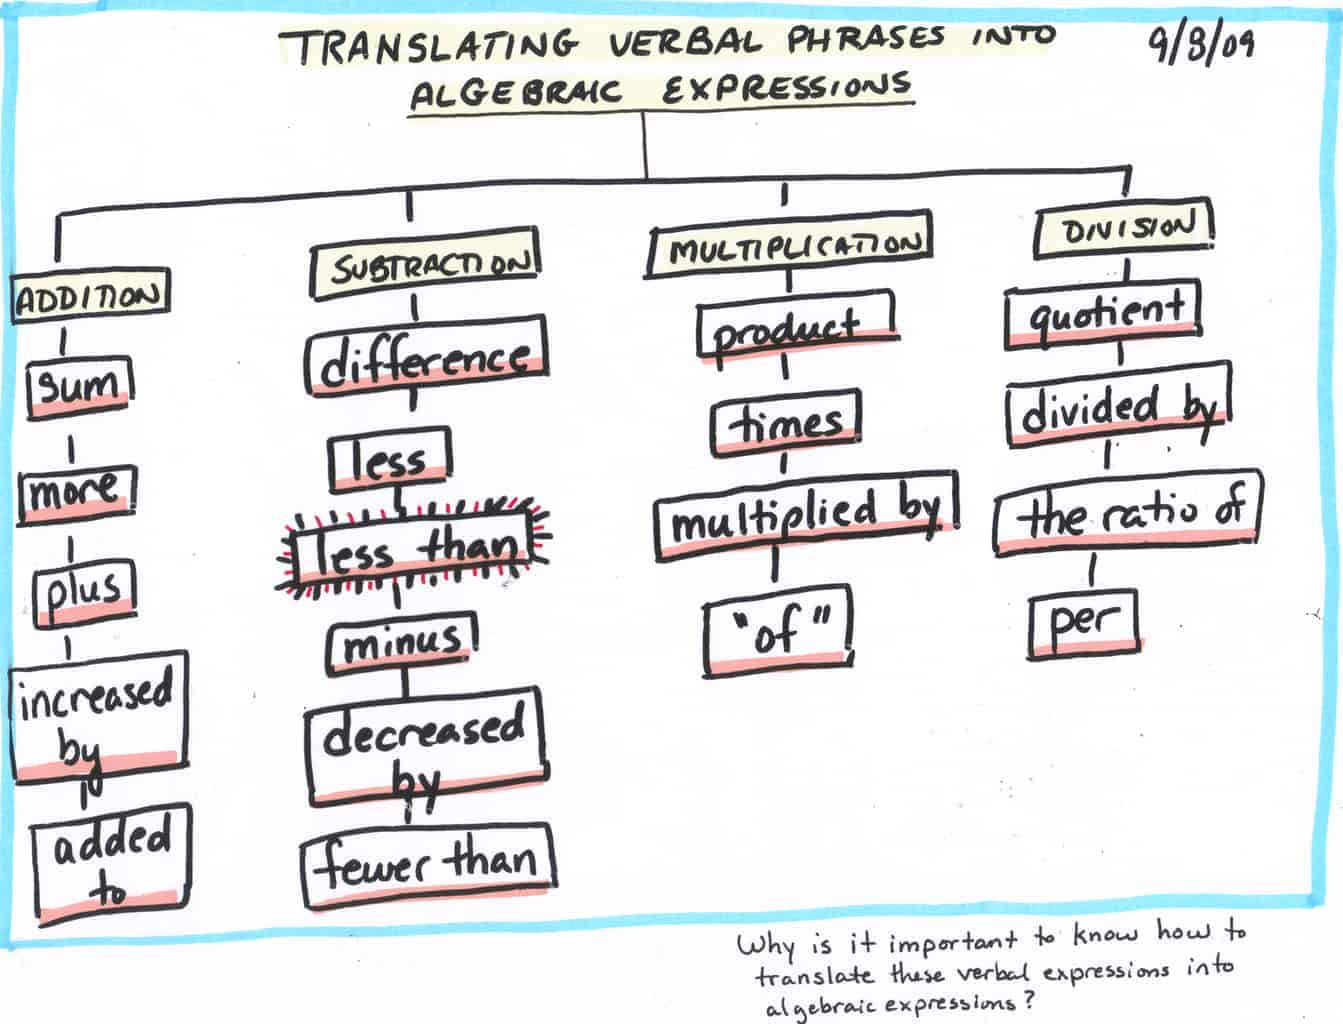 translating key words and phrases into Ccbc math 081 translating english sentences into mathematical equations and 57 translating english sentences into mathematical key words and phrases.